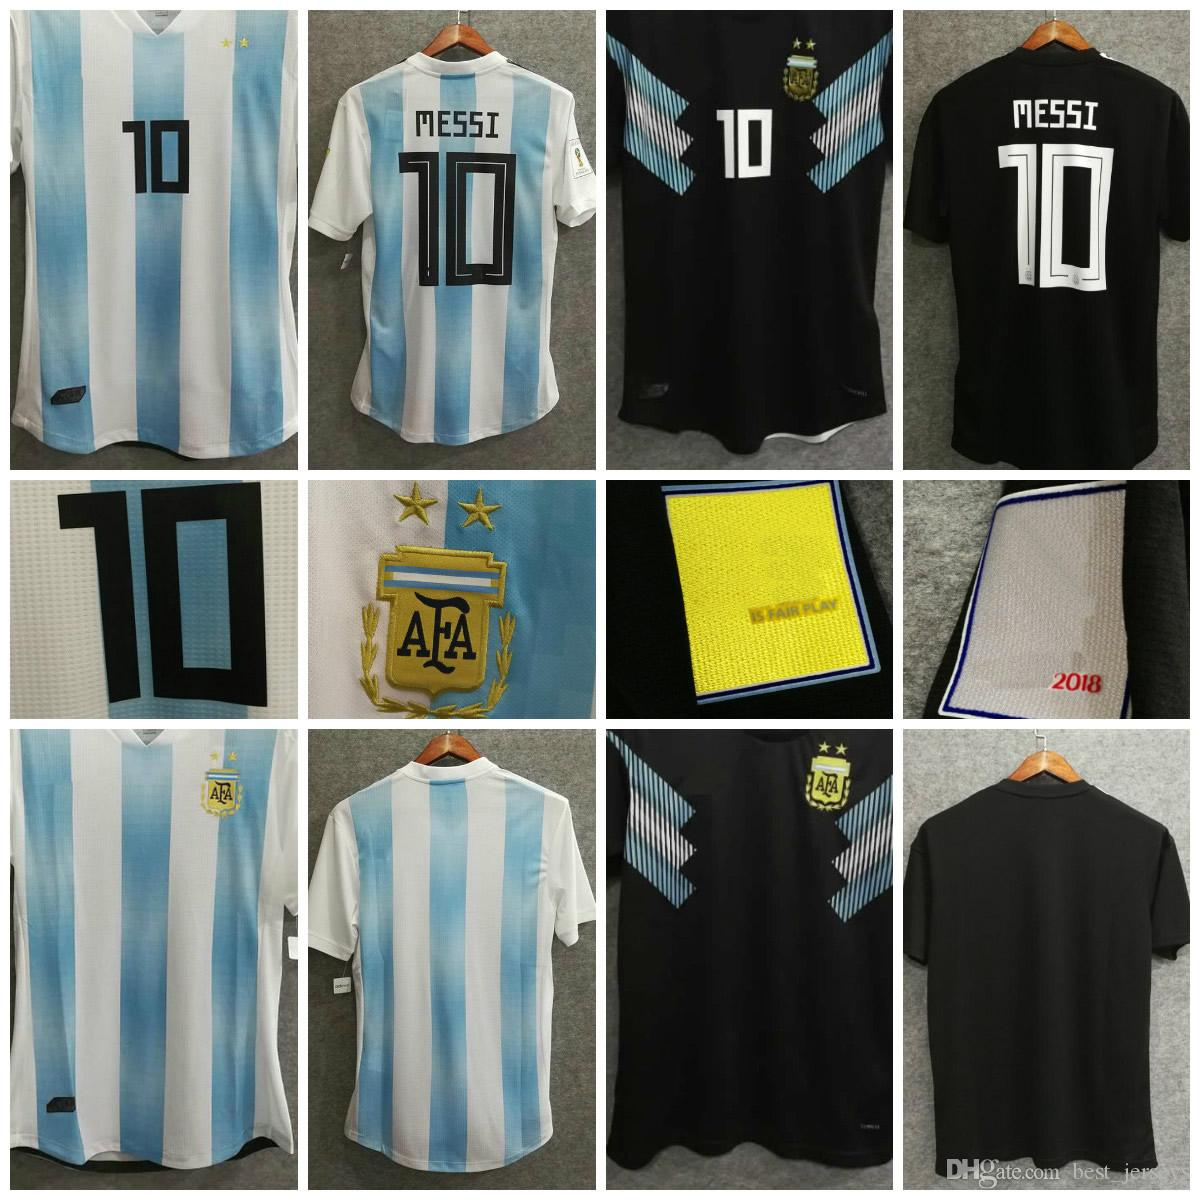 ecbd9717e9c 2019 2018 World Cup Argentina Soccer Jerseys 10 MESSI KUN AGUERO MARADONA  HIGUAIN DI MARIA LAMELA ICustom Football Shirts Home Away From  Best_jerseys, ...